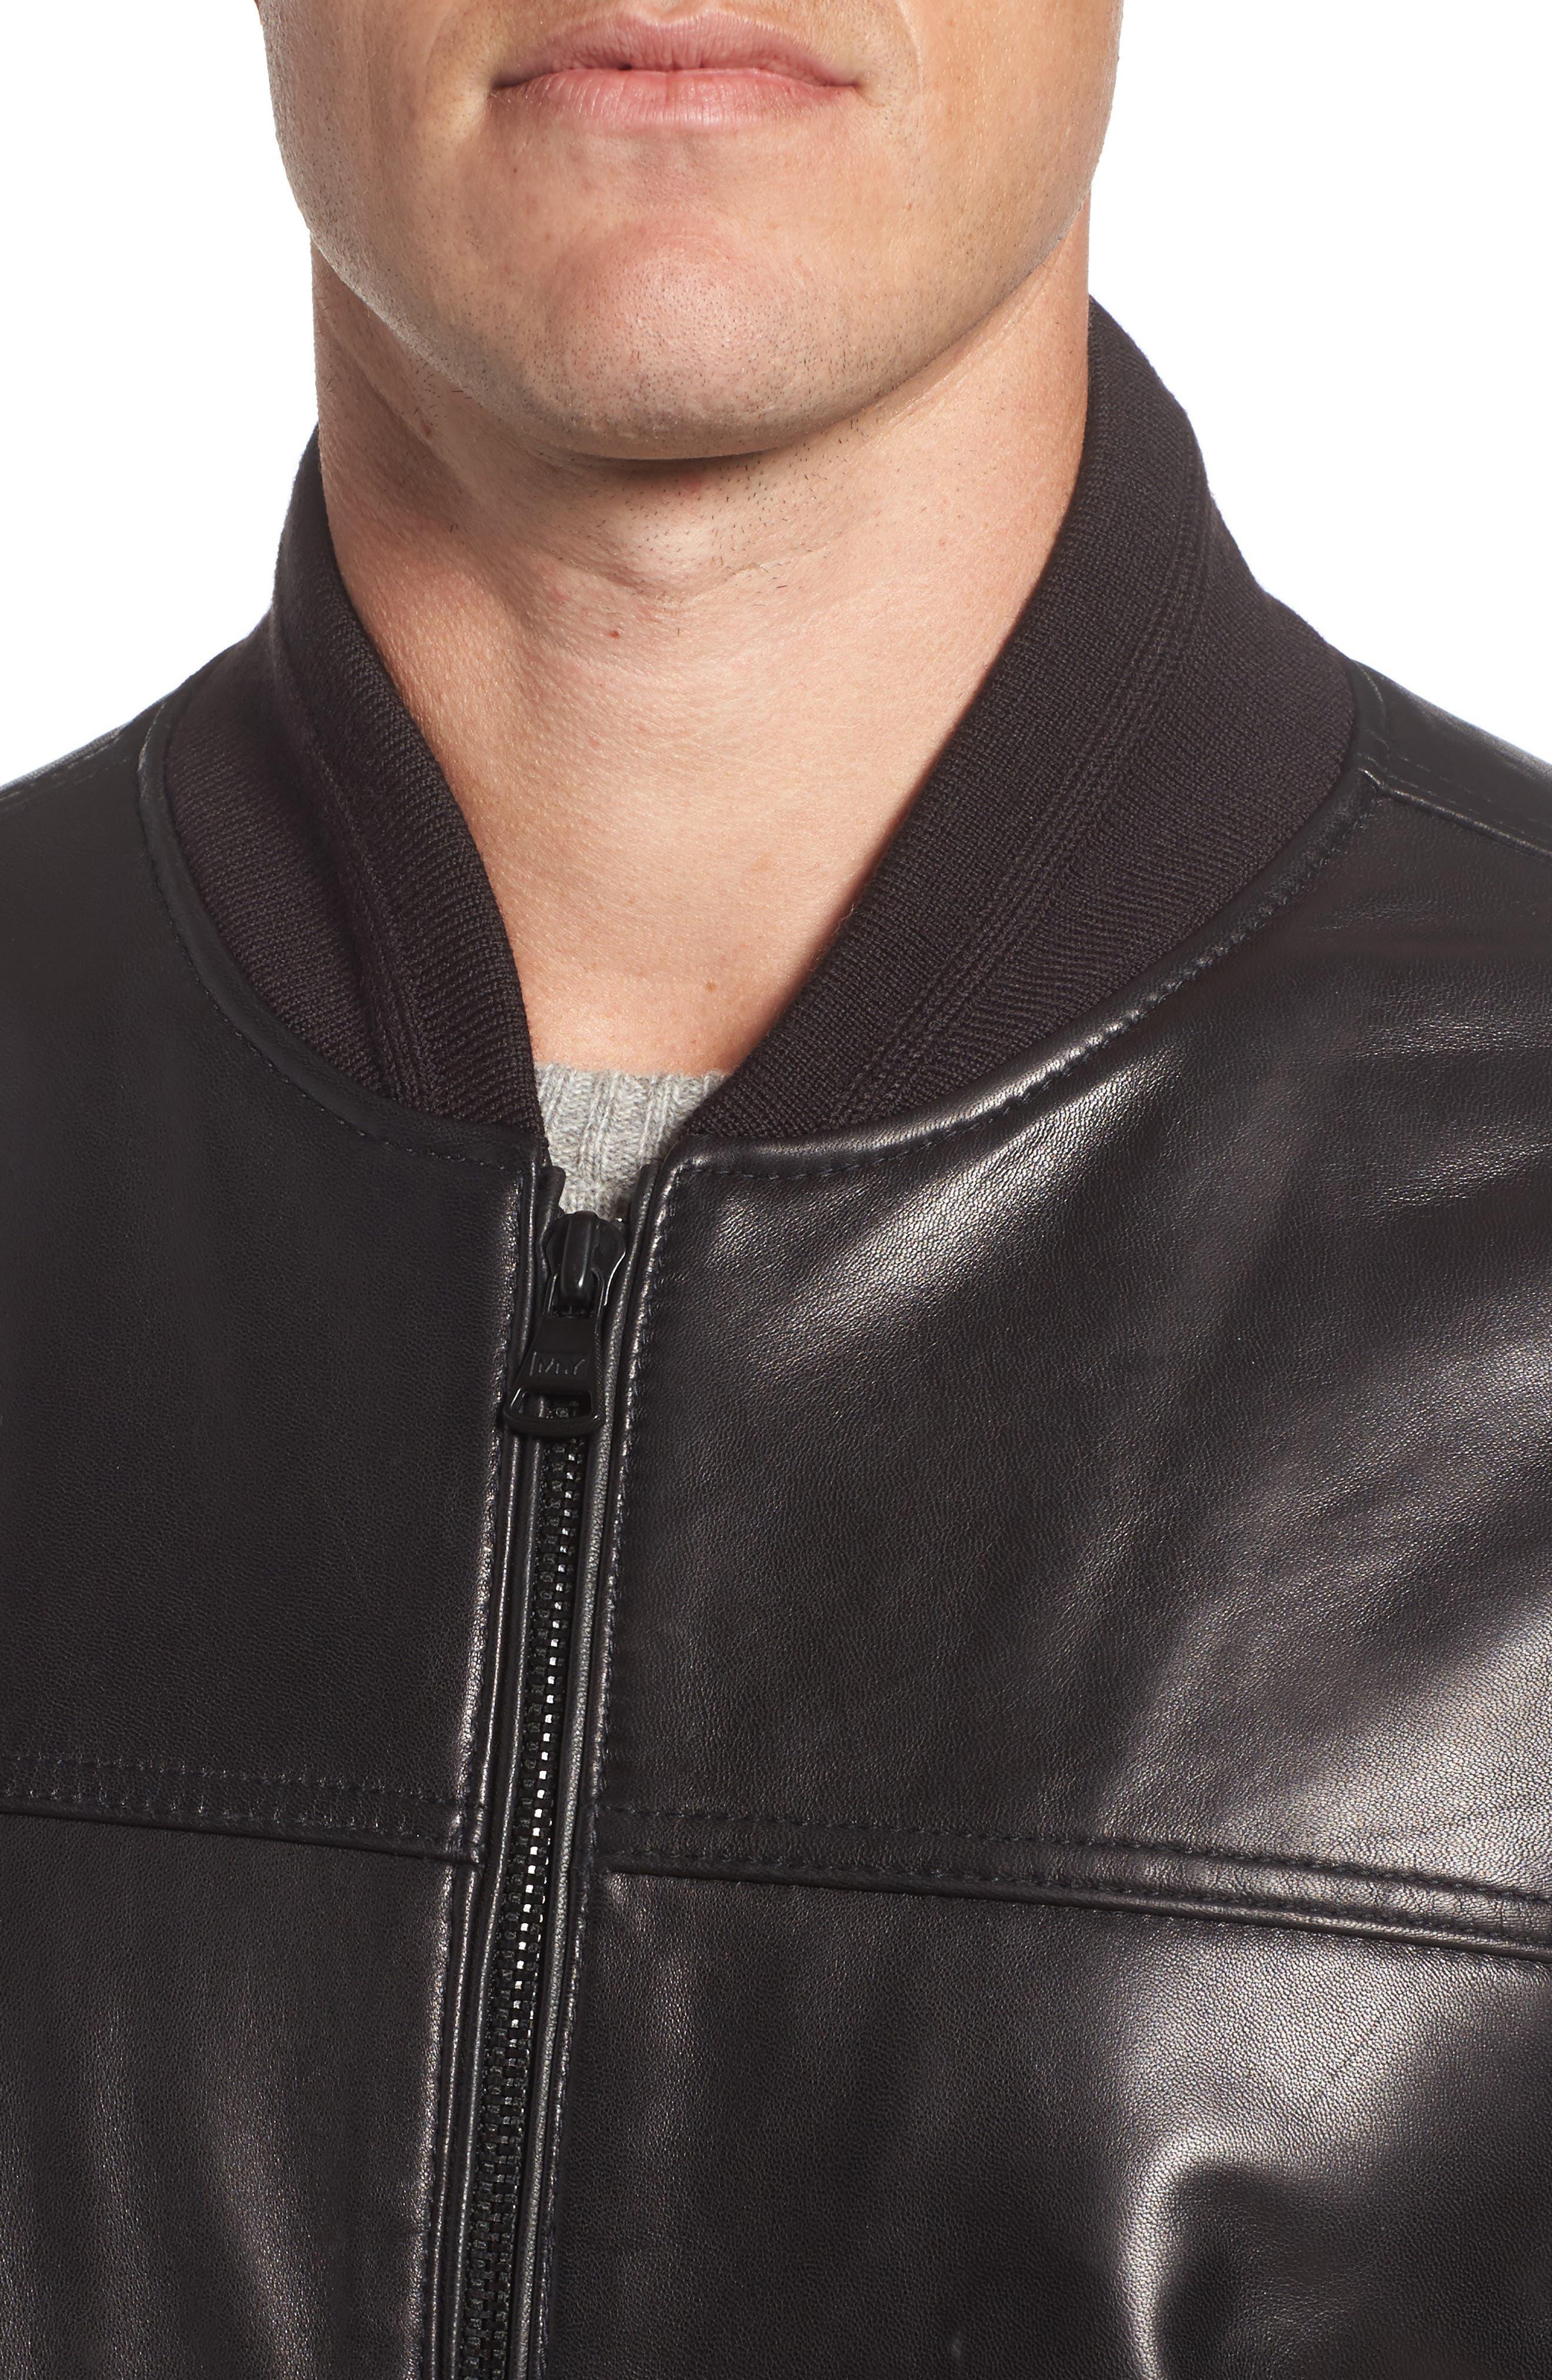 MARC NEW YORK, Summit Leather Jacket, Alternate thumbnail 4, color, BLACK